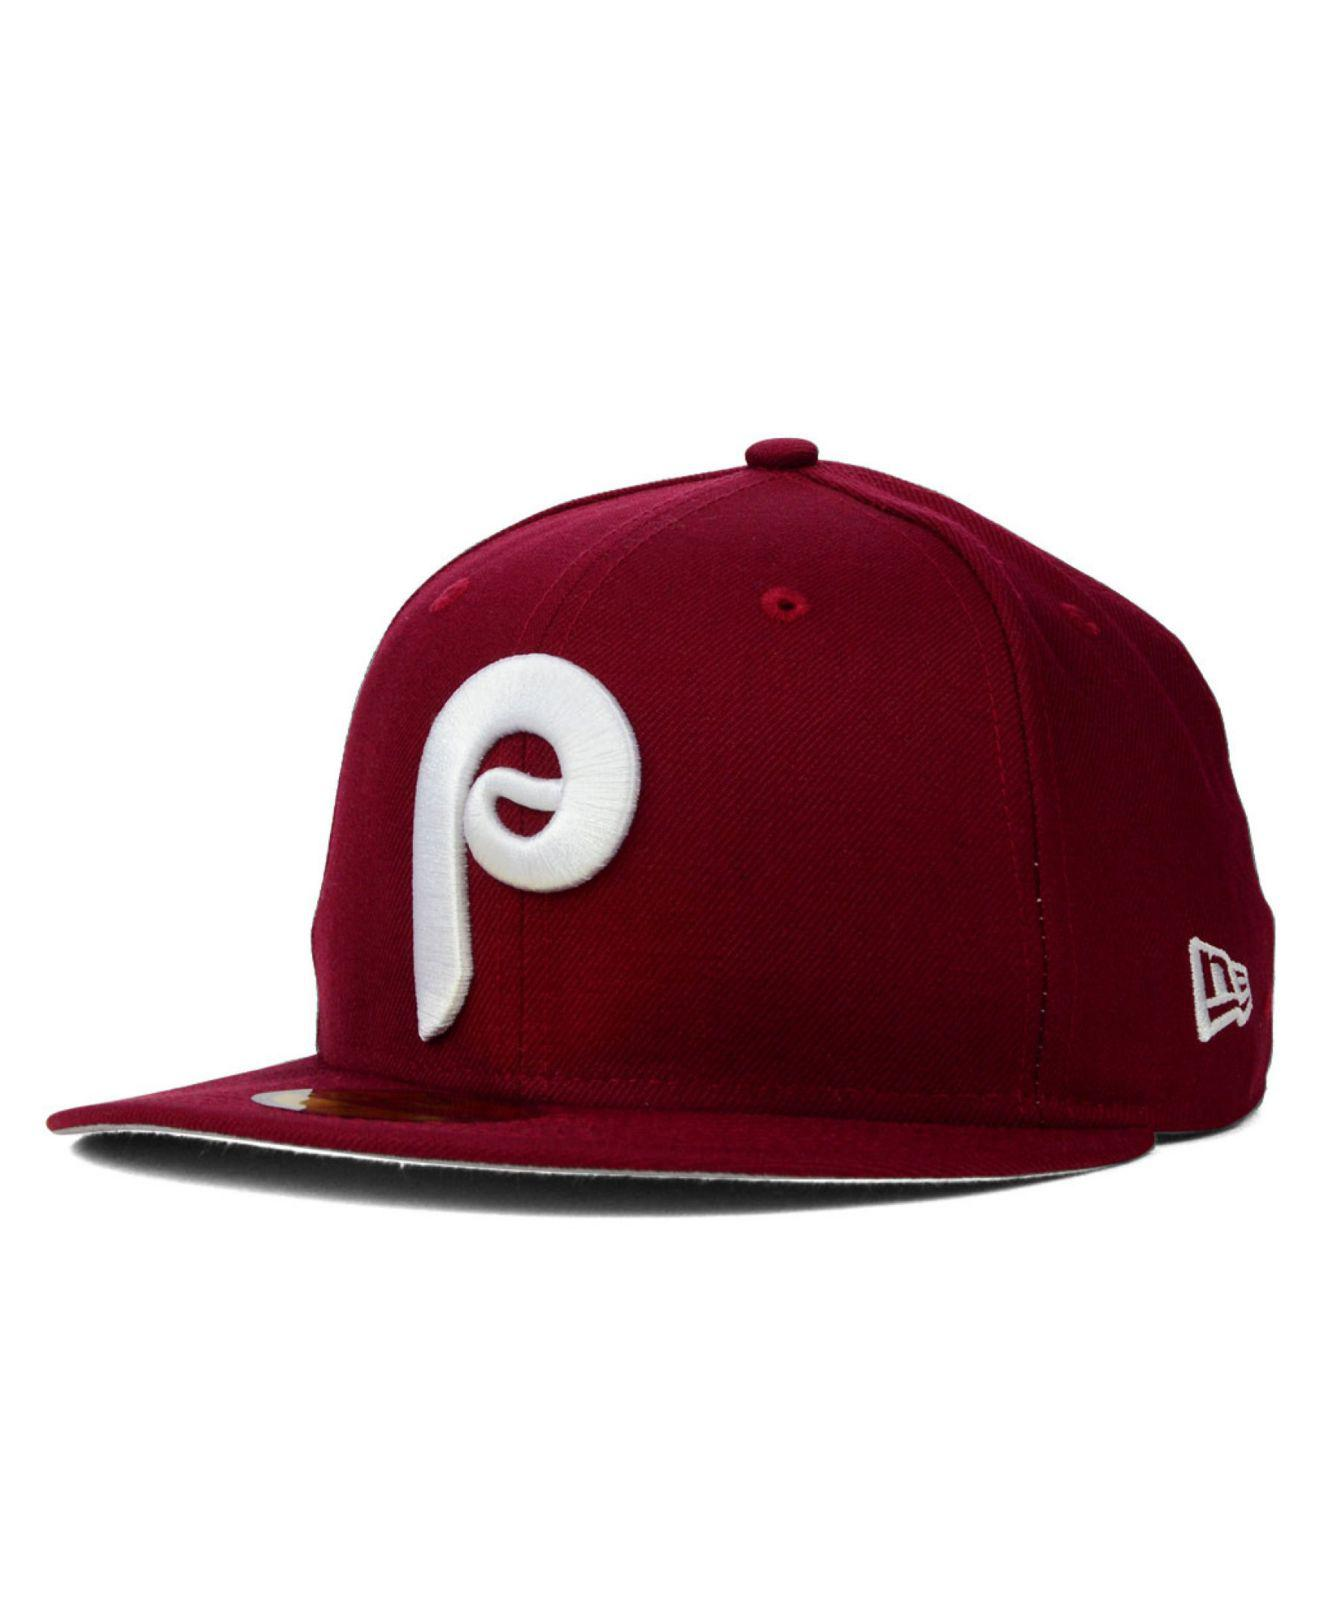 hot sale online 736fd 22ad2 KTZ - Red Philadelphia Phillies Mlb Cooperstown 59fifty Cap for Men - Lyst.  View fullscreen